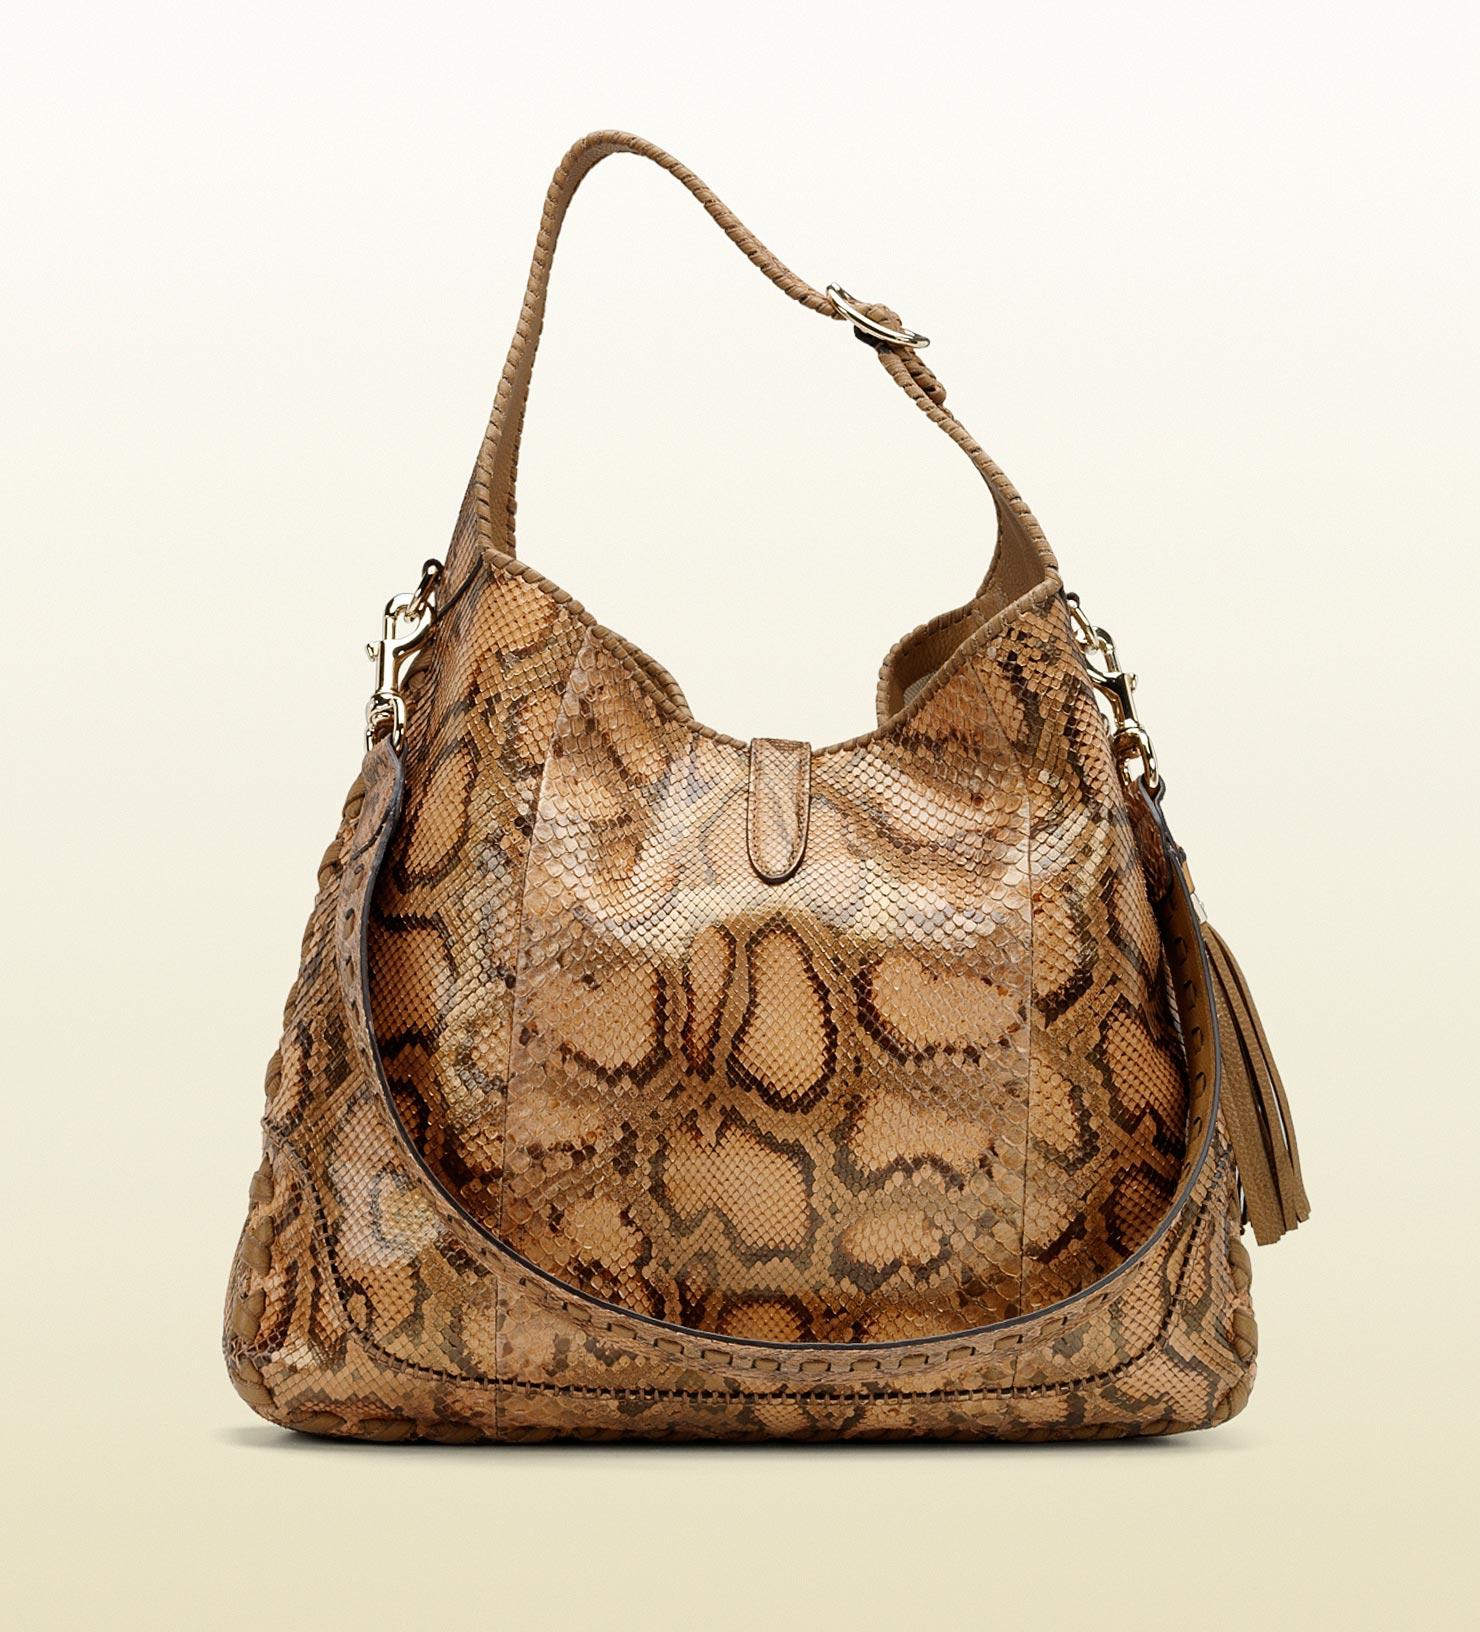 e815c221f28d Gucci New Jackie Python Shoulder Bag - Lyst